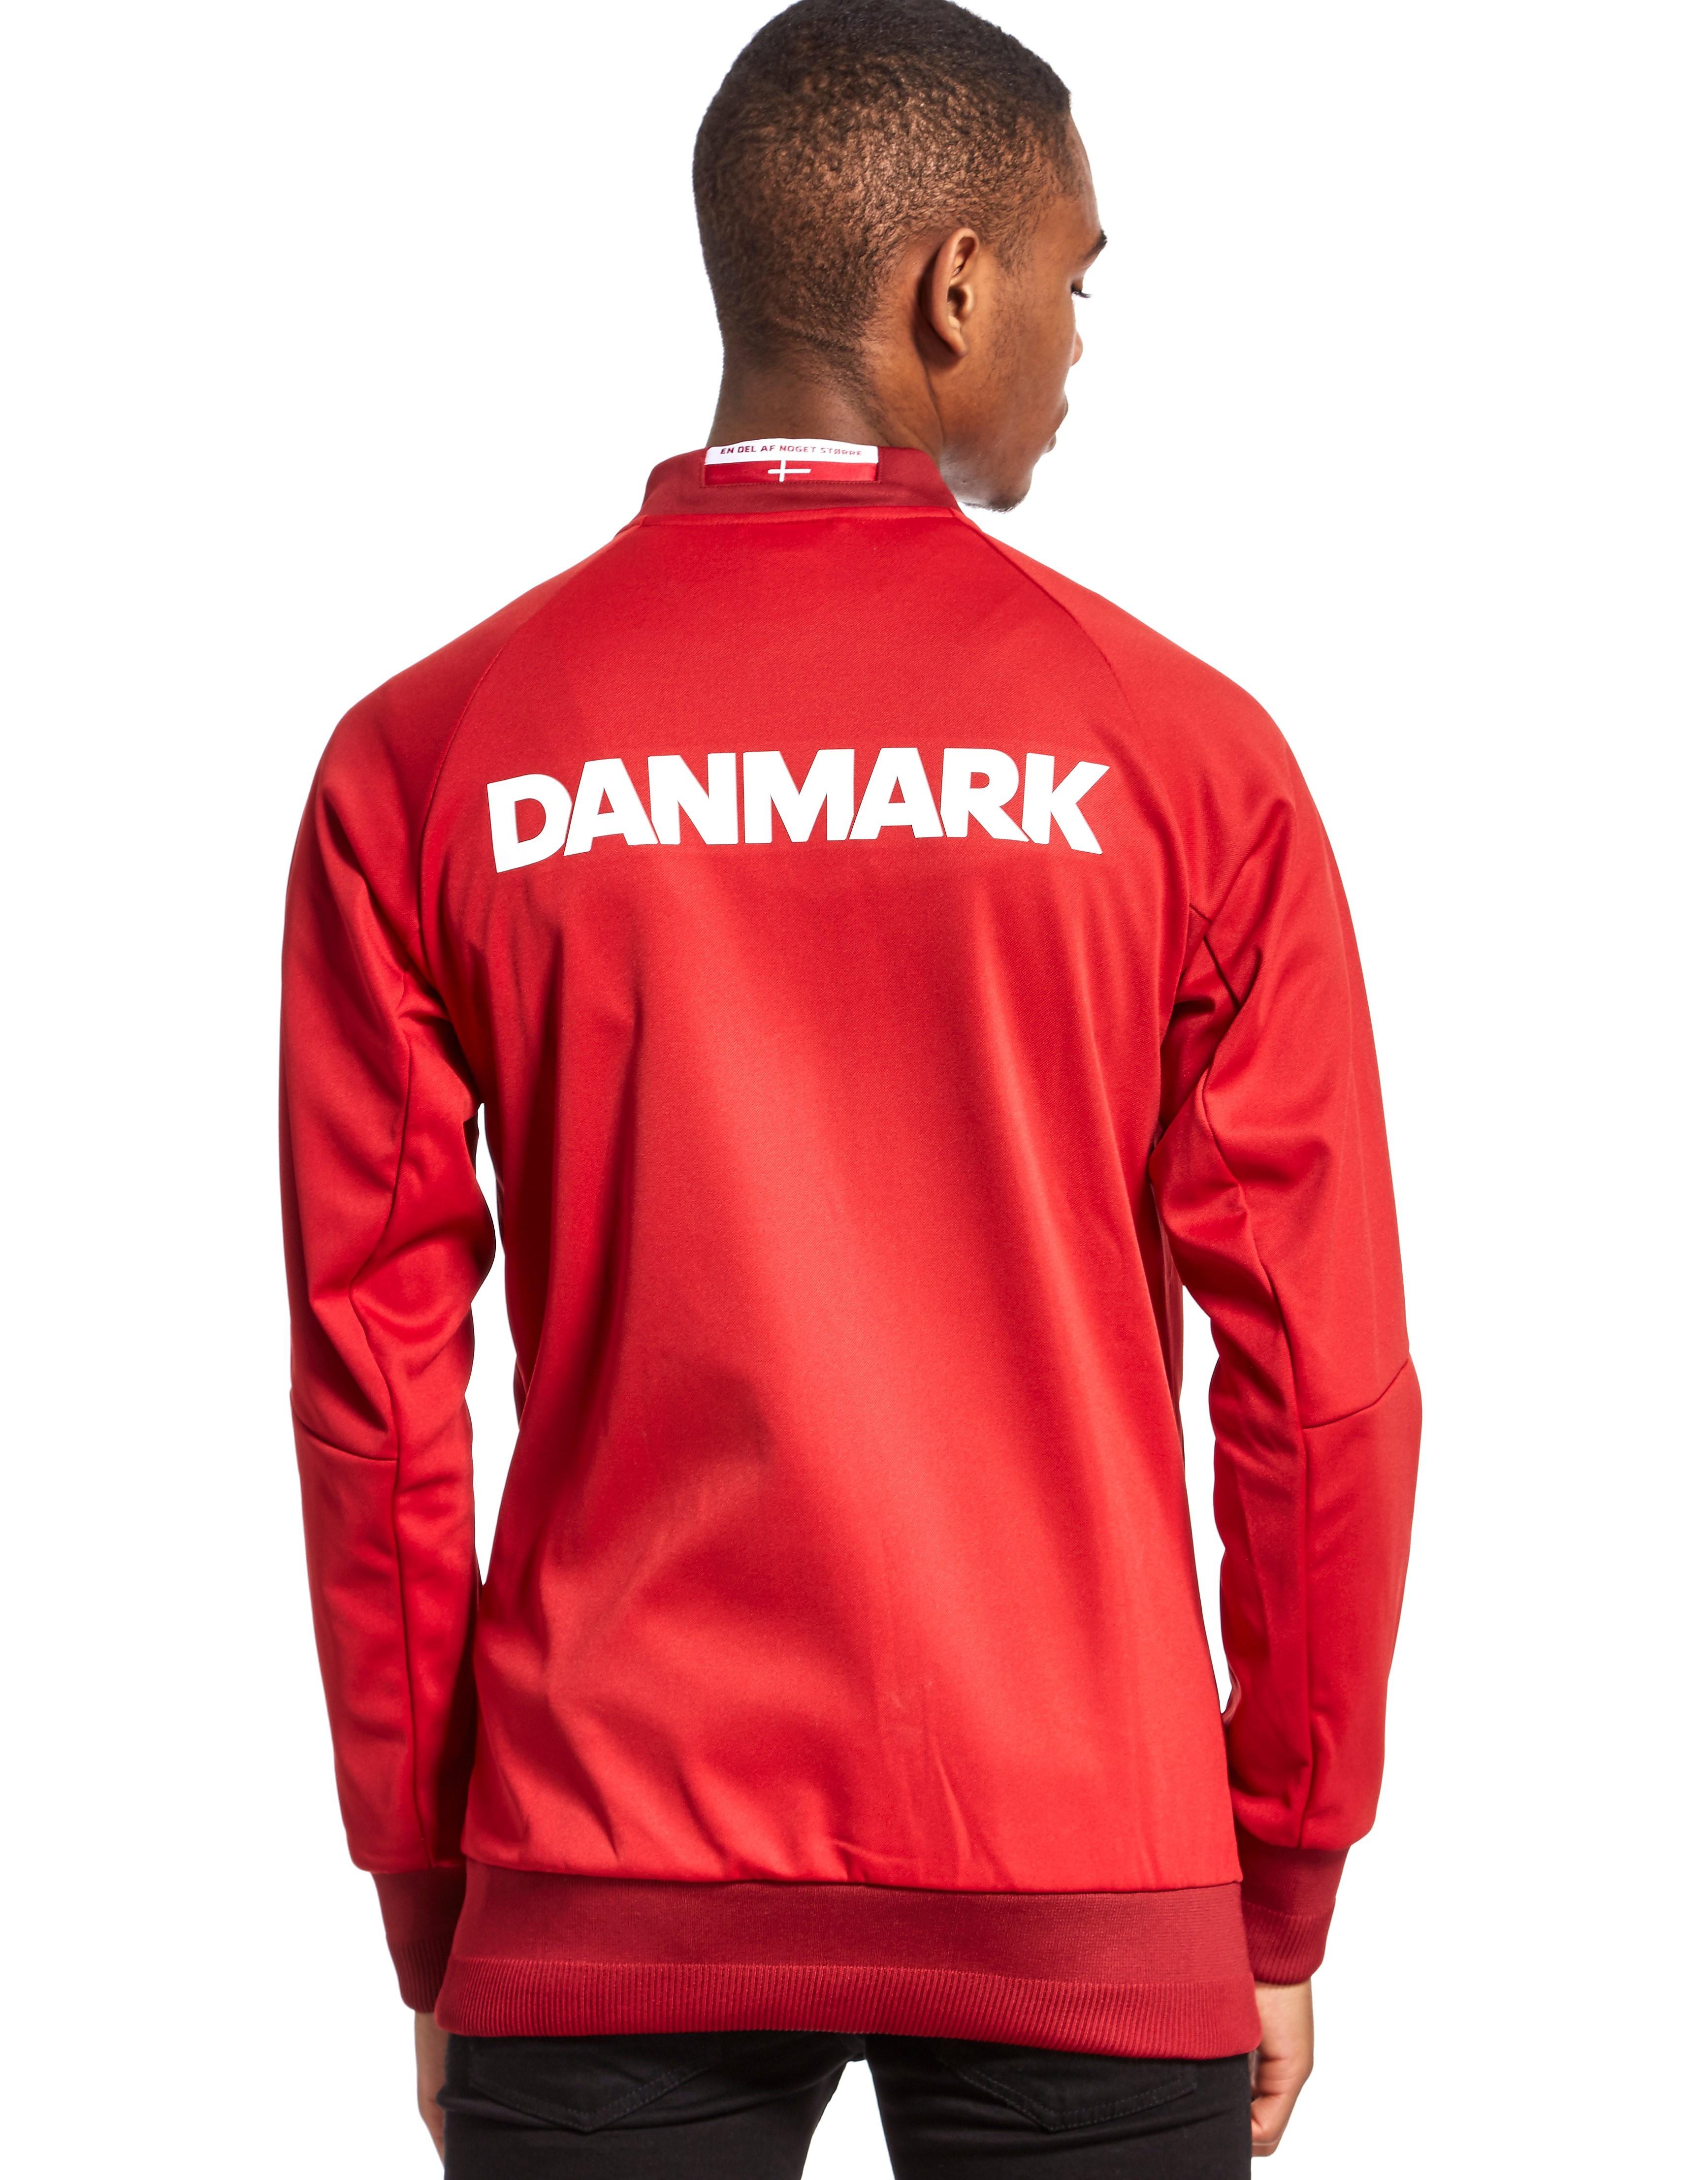 adidas Denmark Anthem Jacket